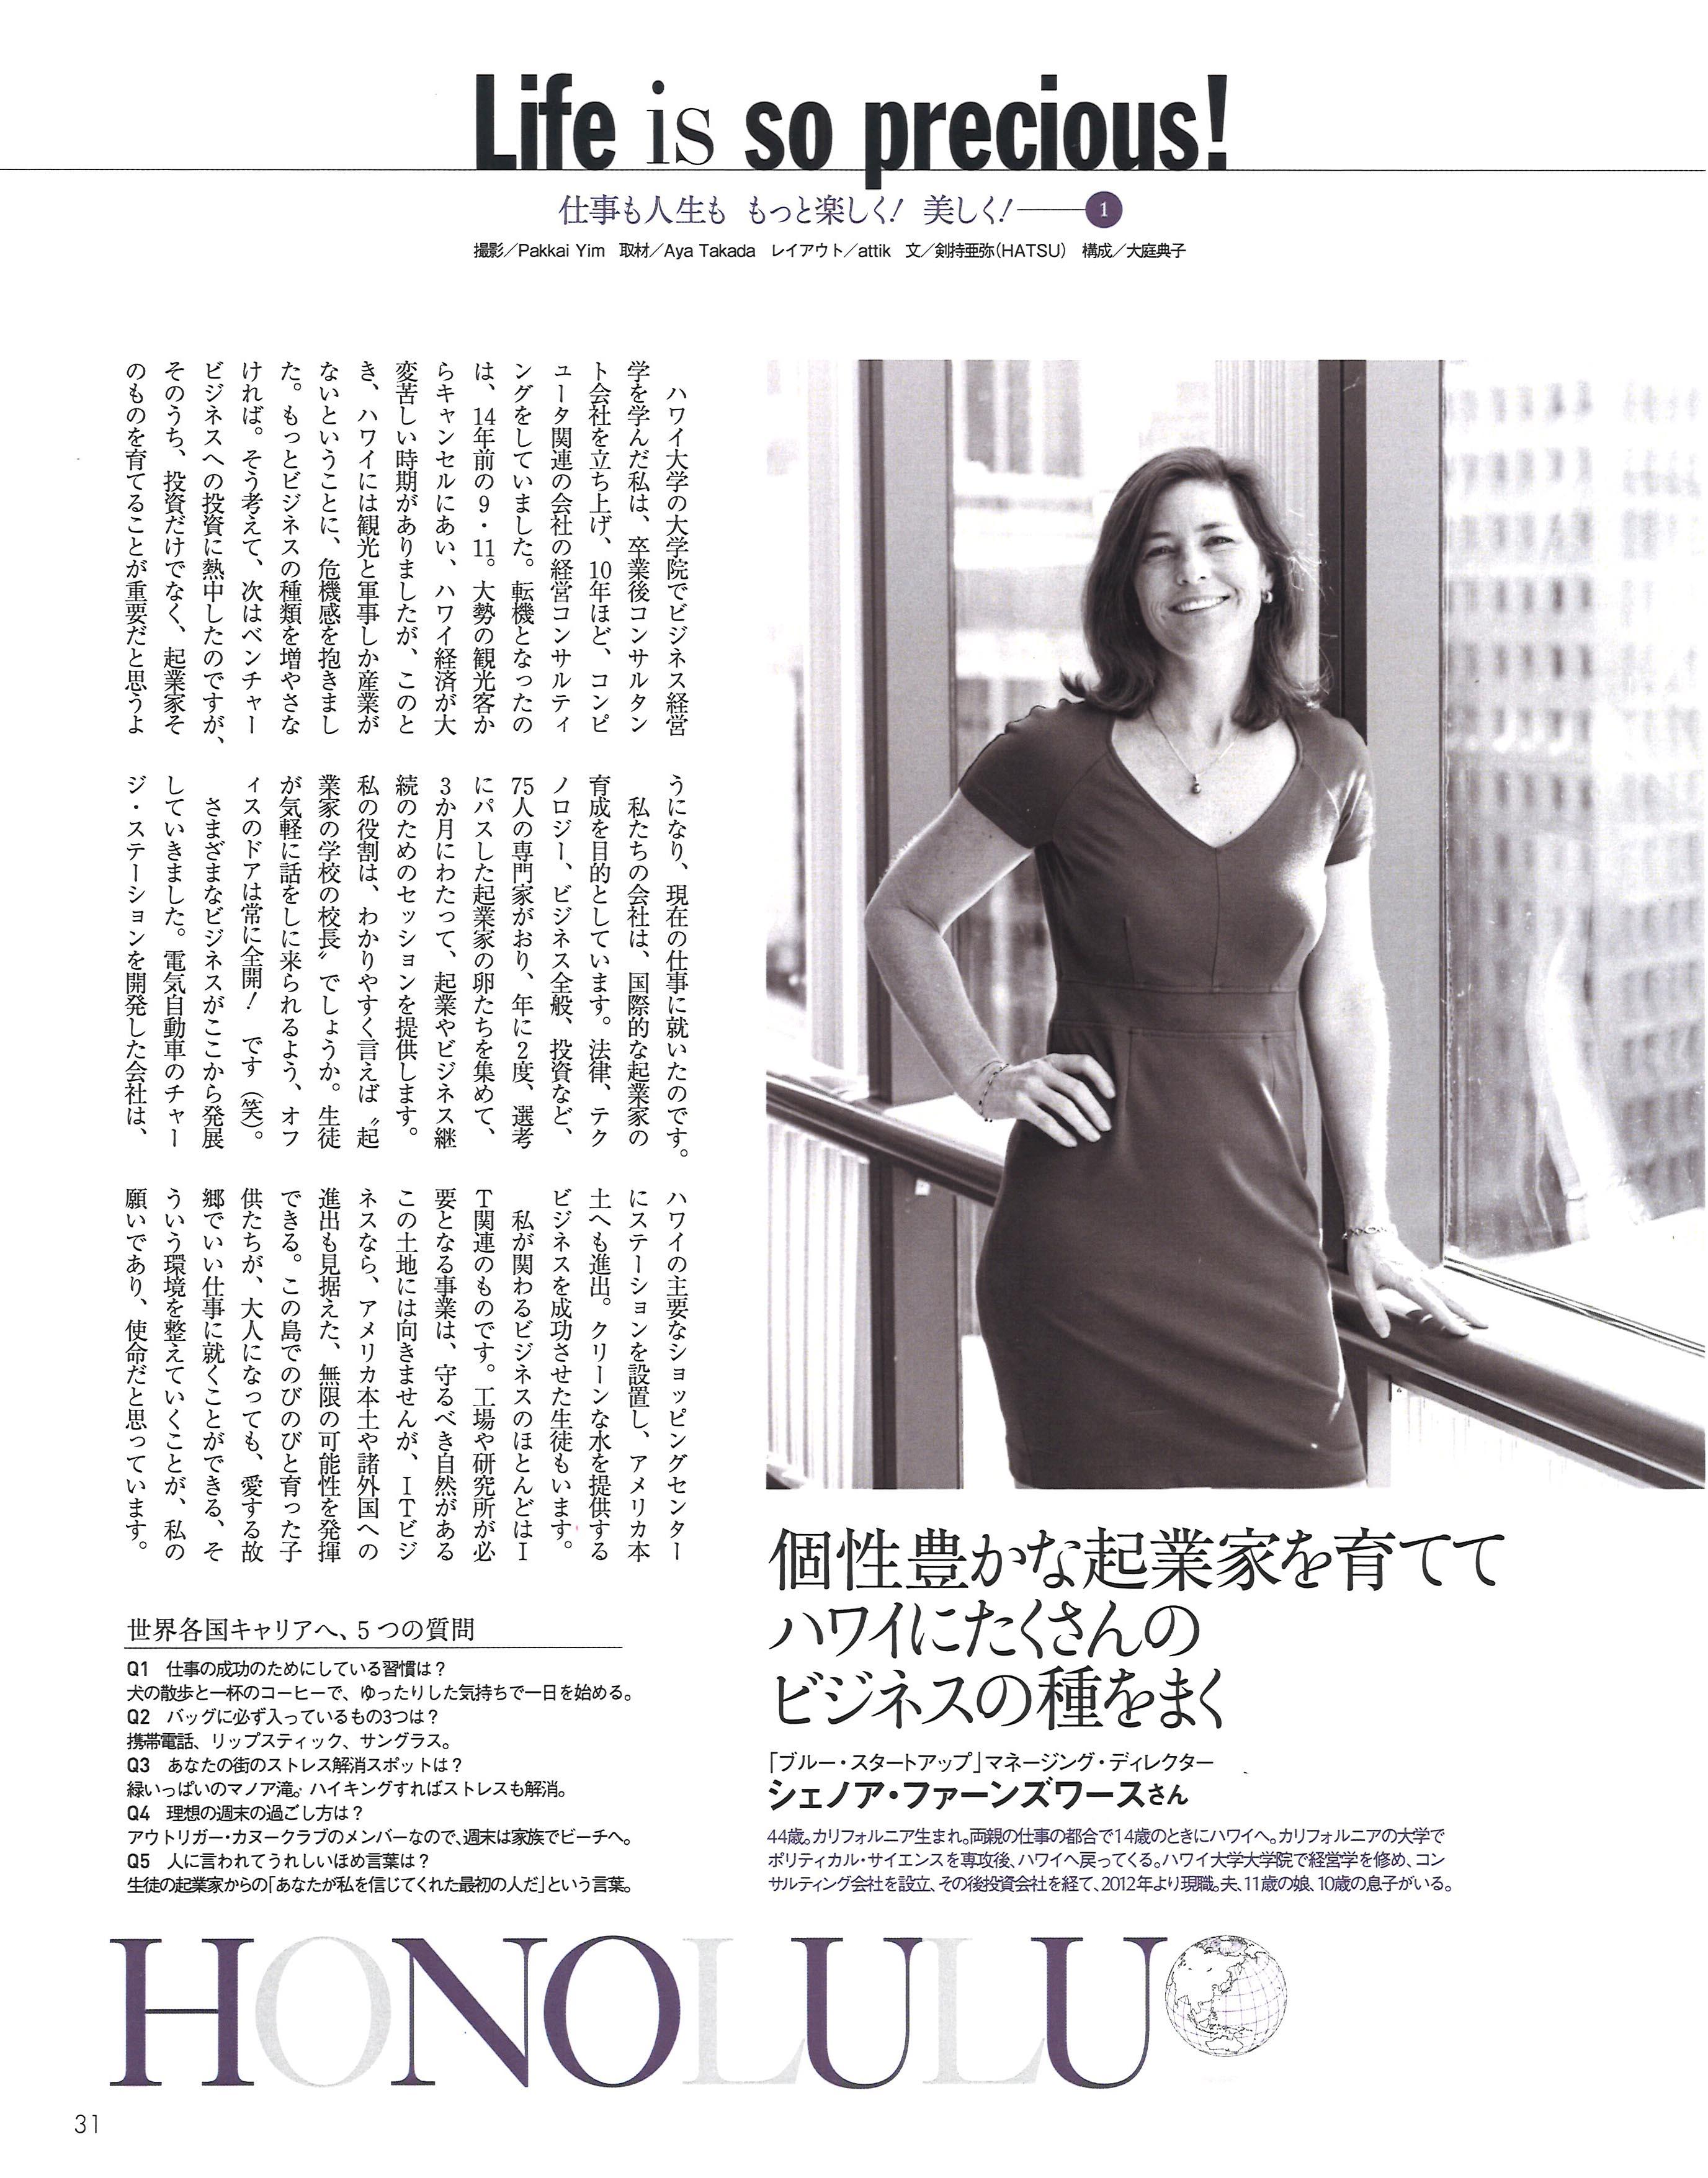 Japan's Precious Magazine features Chenoa Farnsworth & Blue Startups